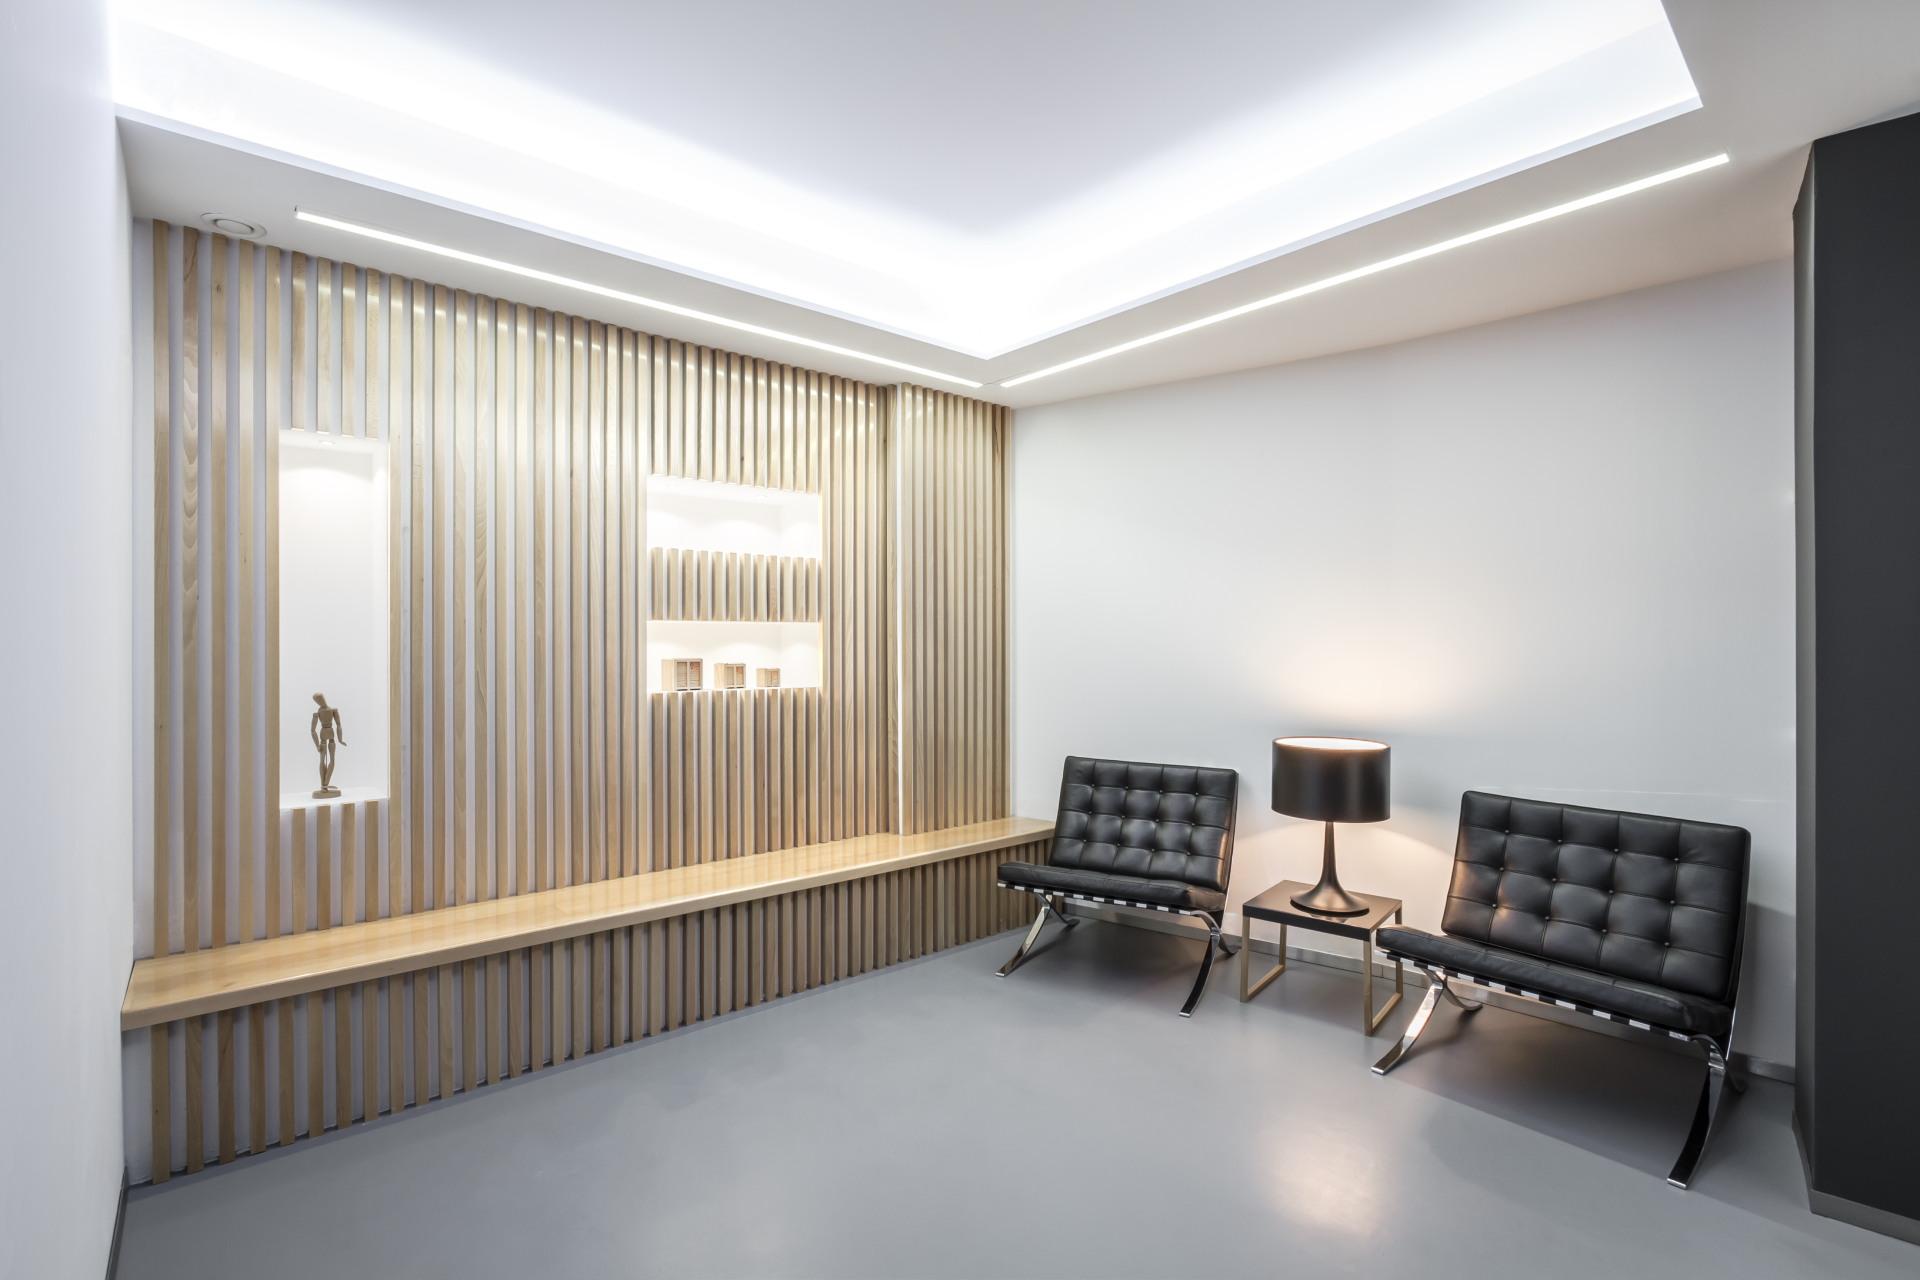 fotografia-arquitectura-valencia-german-cabo-hernandez-clinica (3)